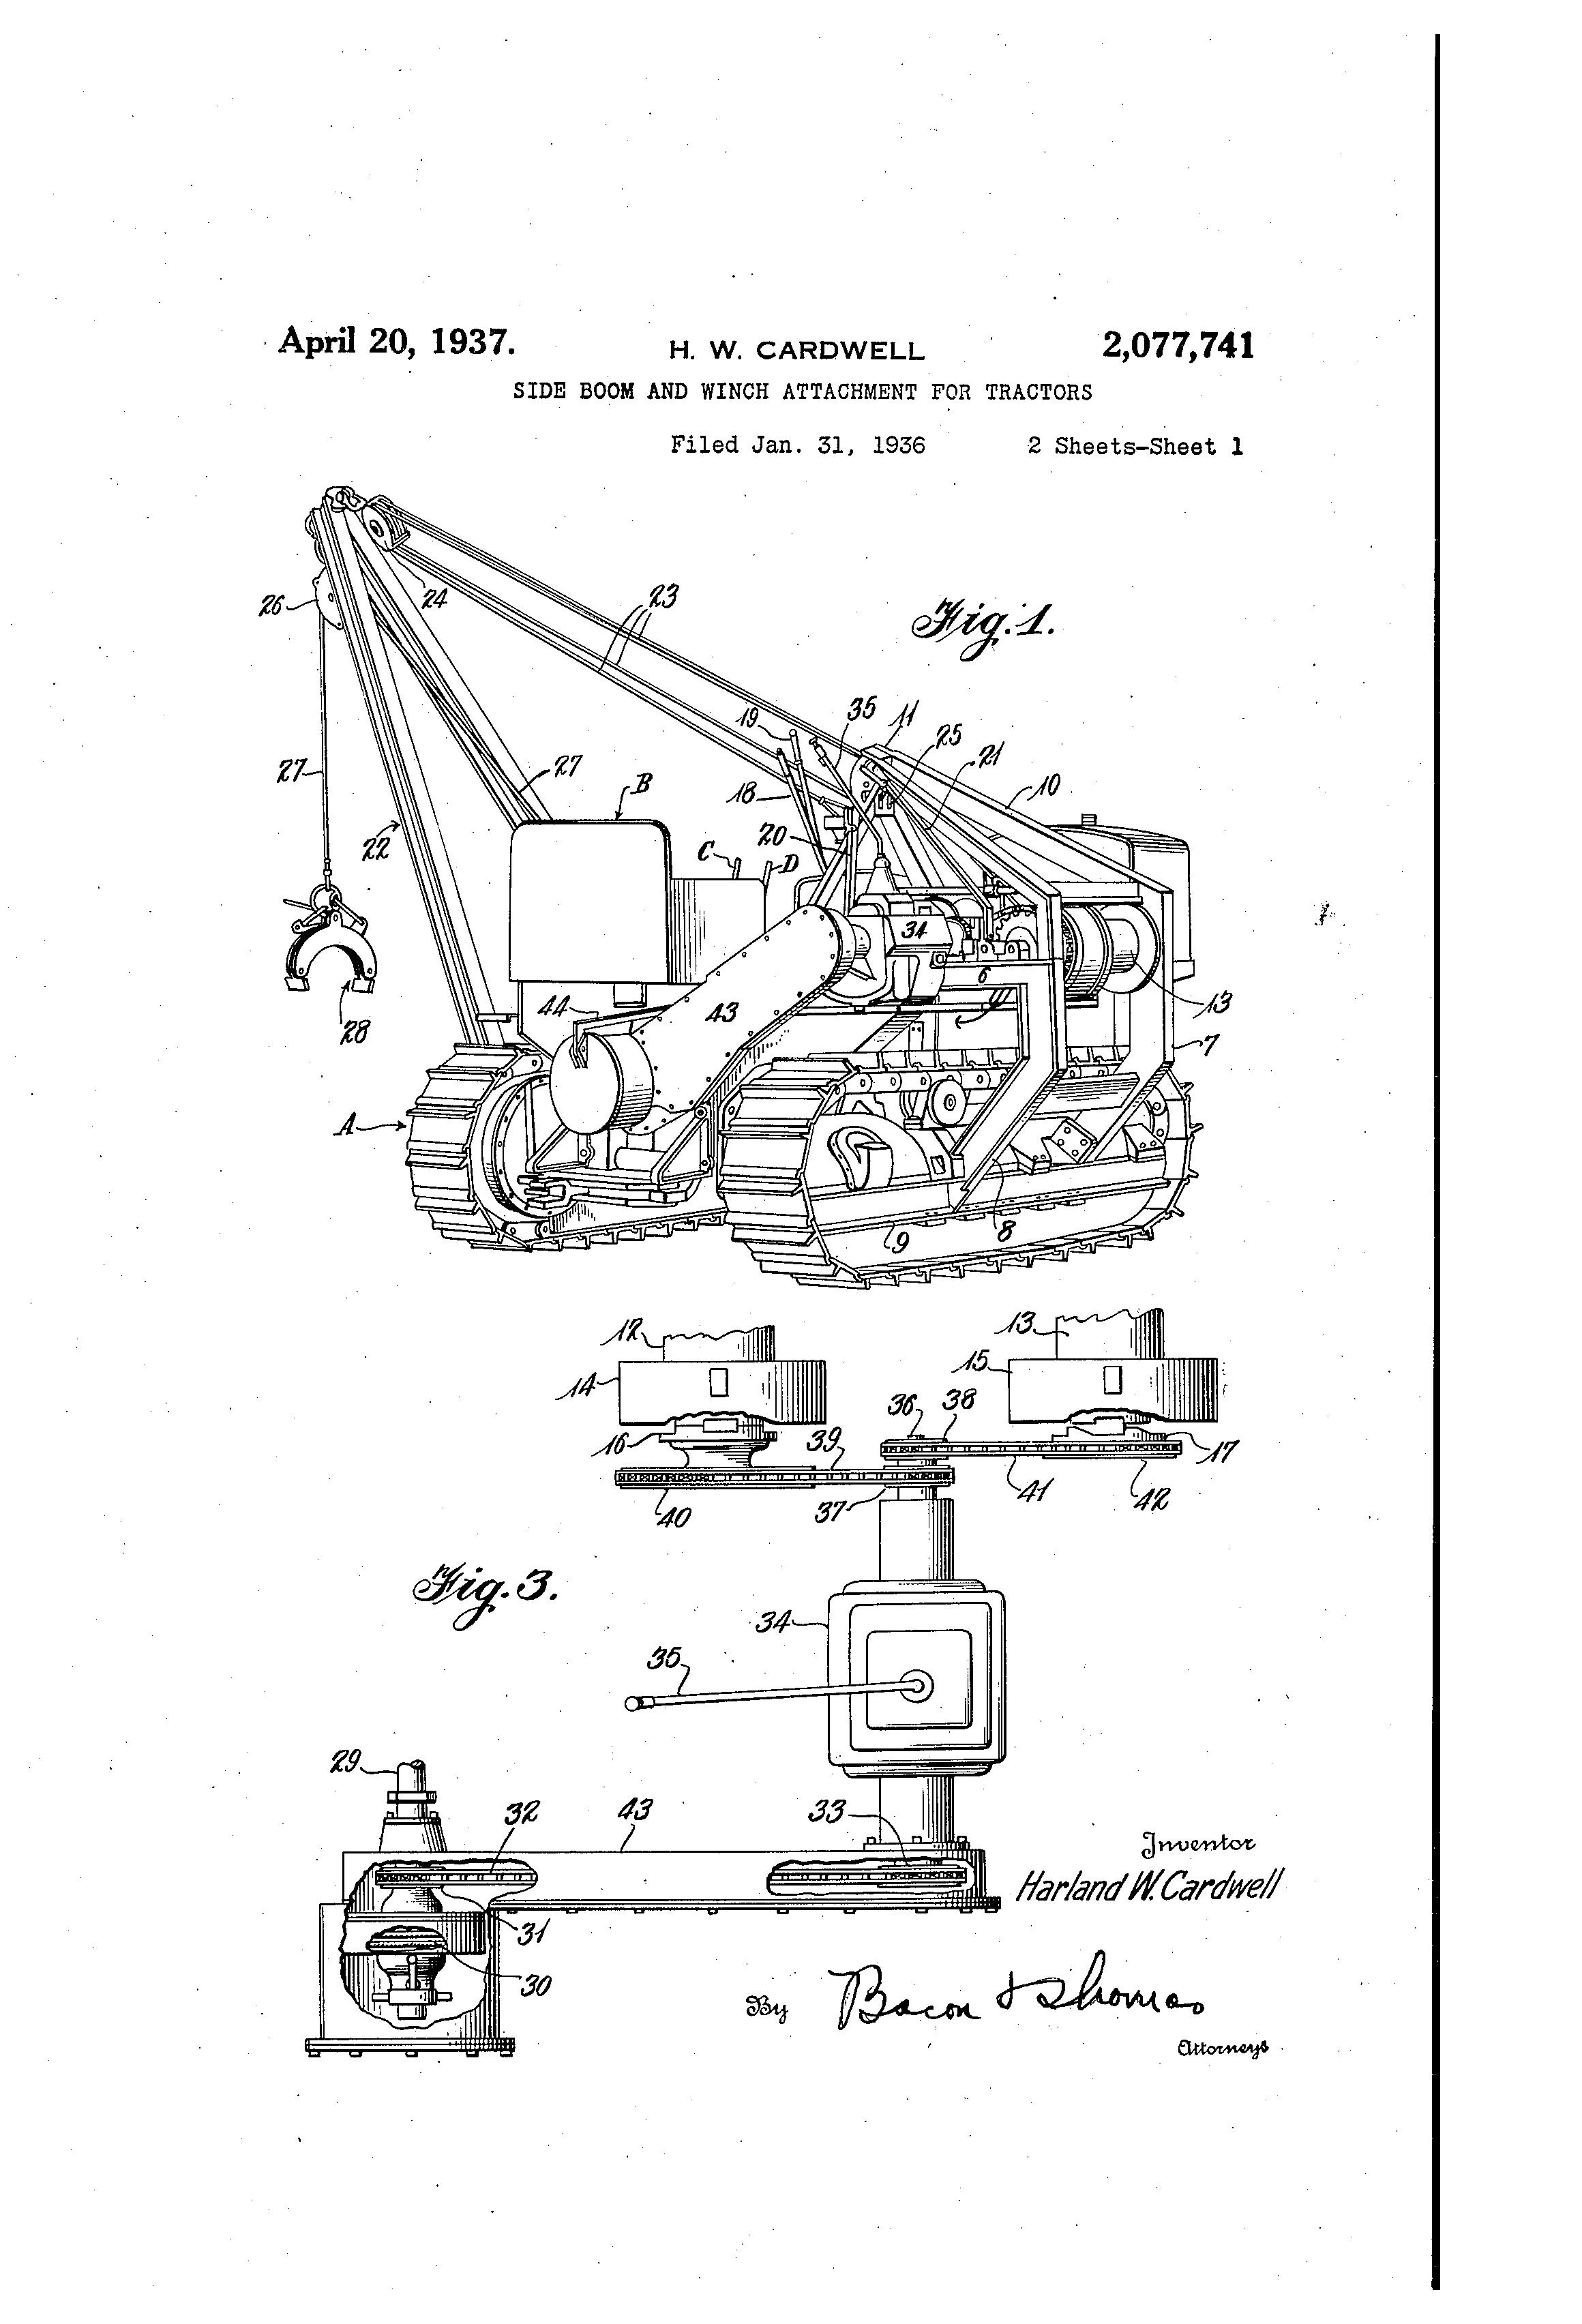 posatubi  pipelayer-posatubi US2077741-0